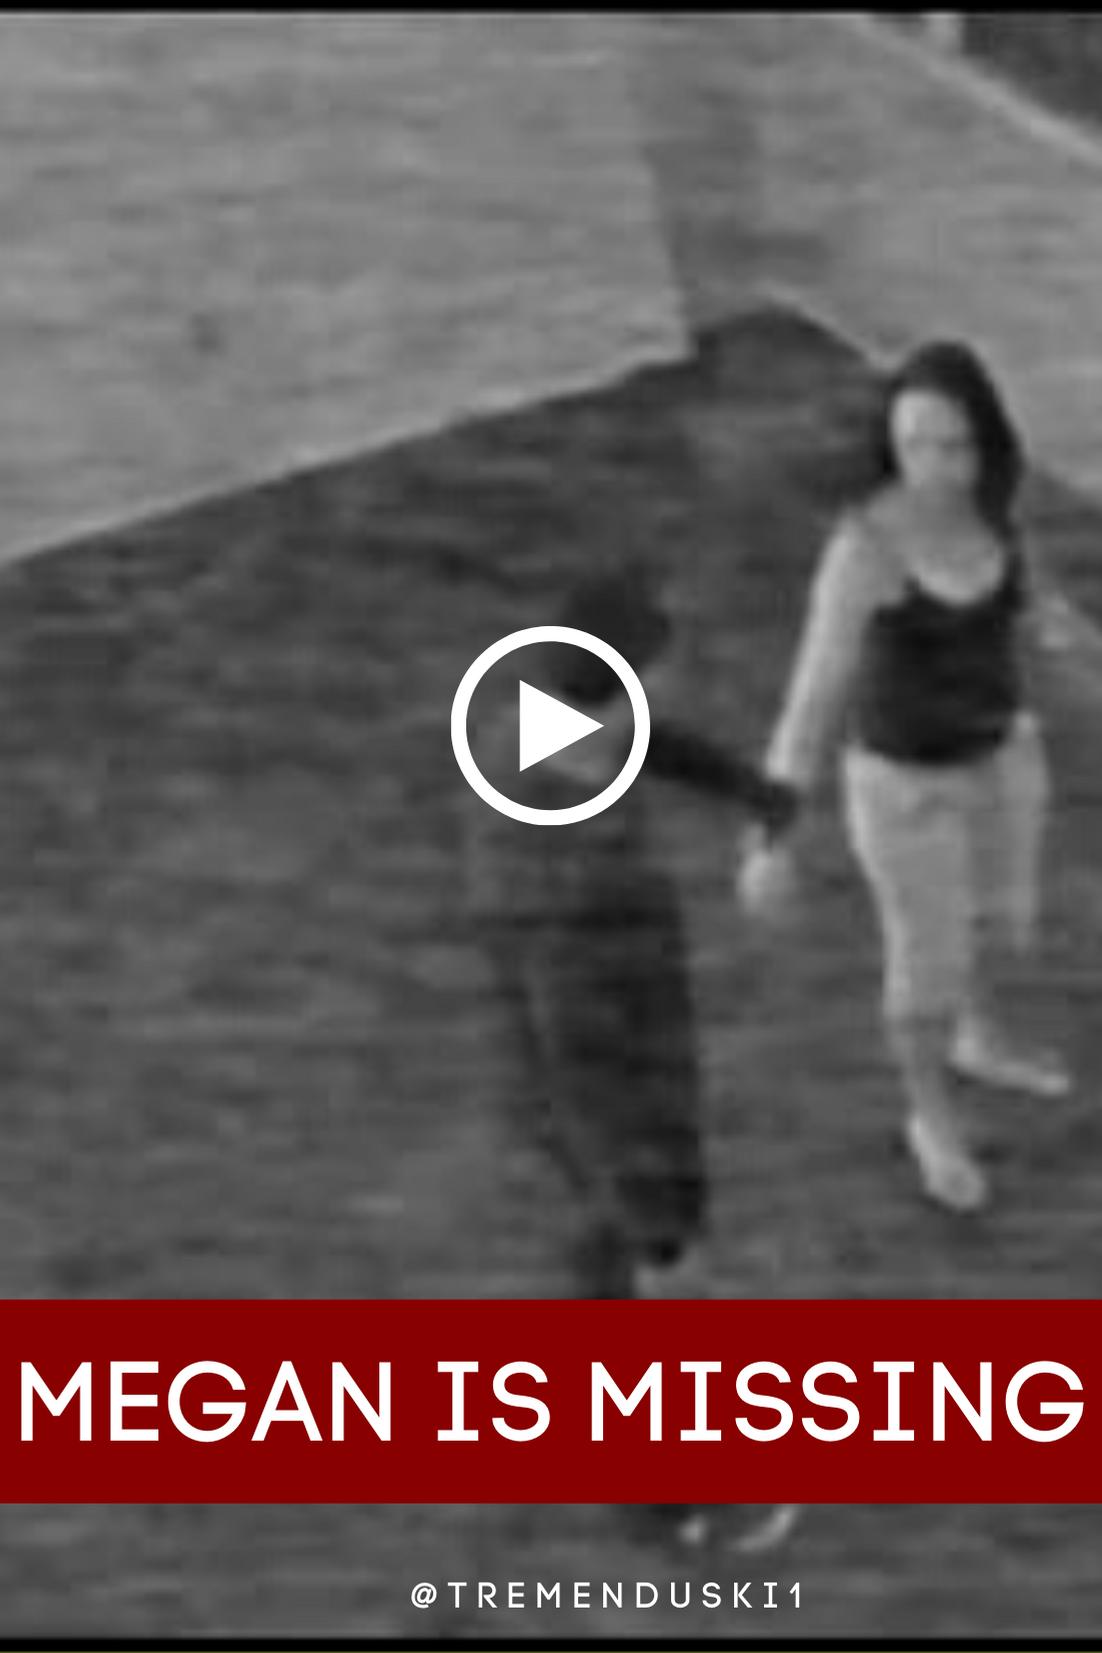 Megan Is Missing Creepy Images Megan Miss